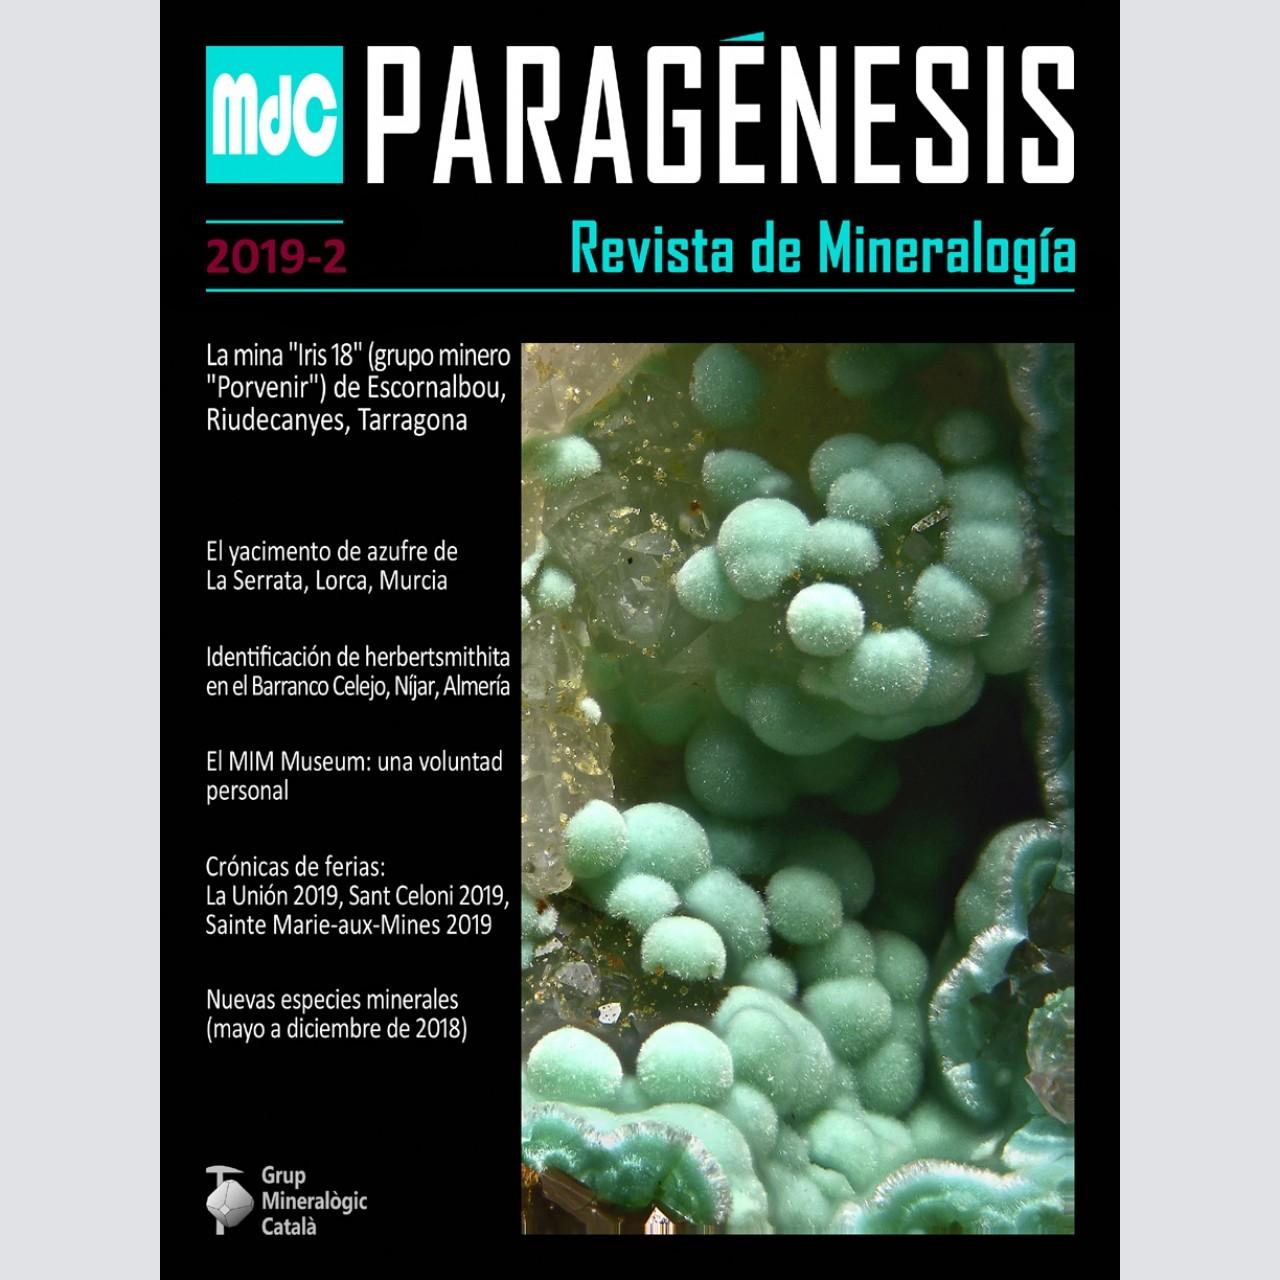 Paragénesis. Revista de Mineralogía (2019-2)